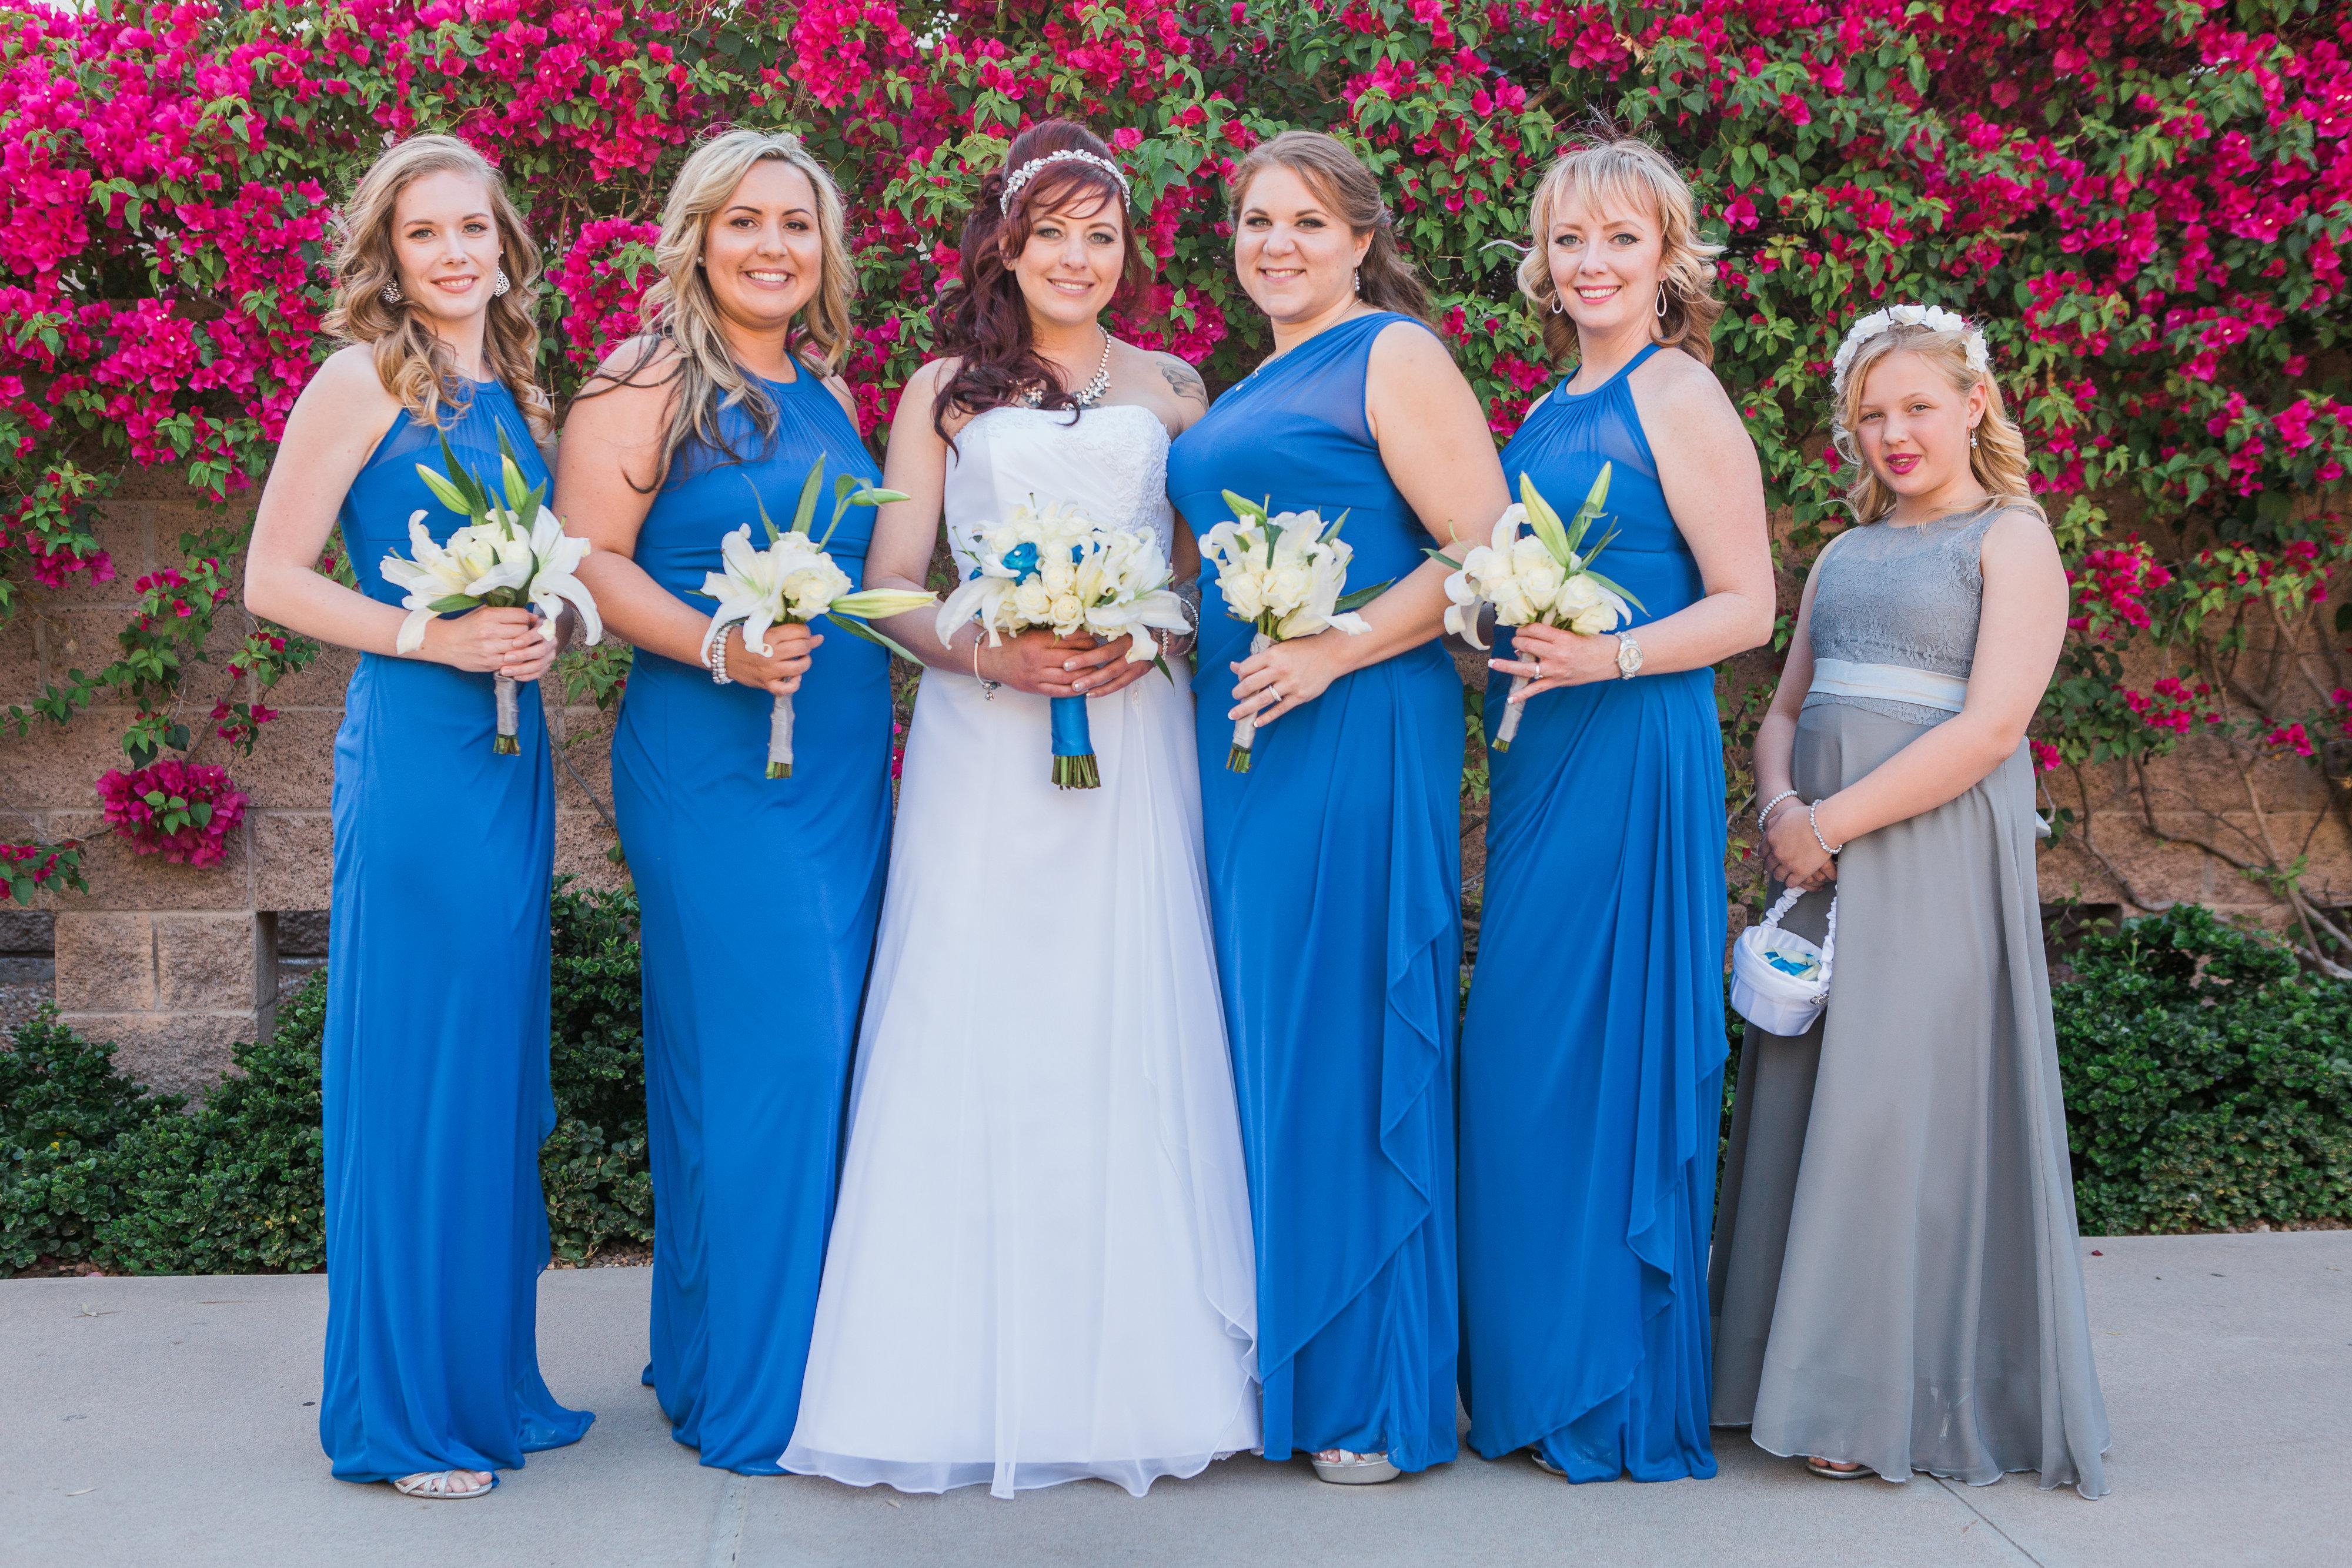 View More: http://brashlerphoto.pass.us/pankau-wedding